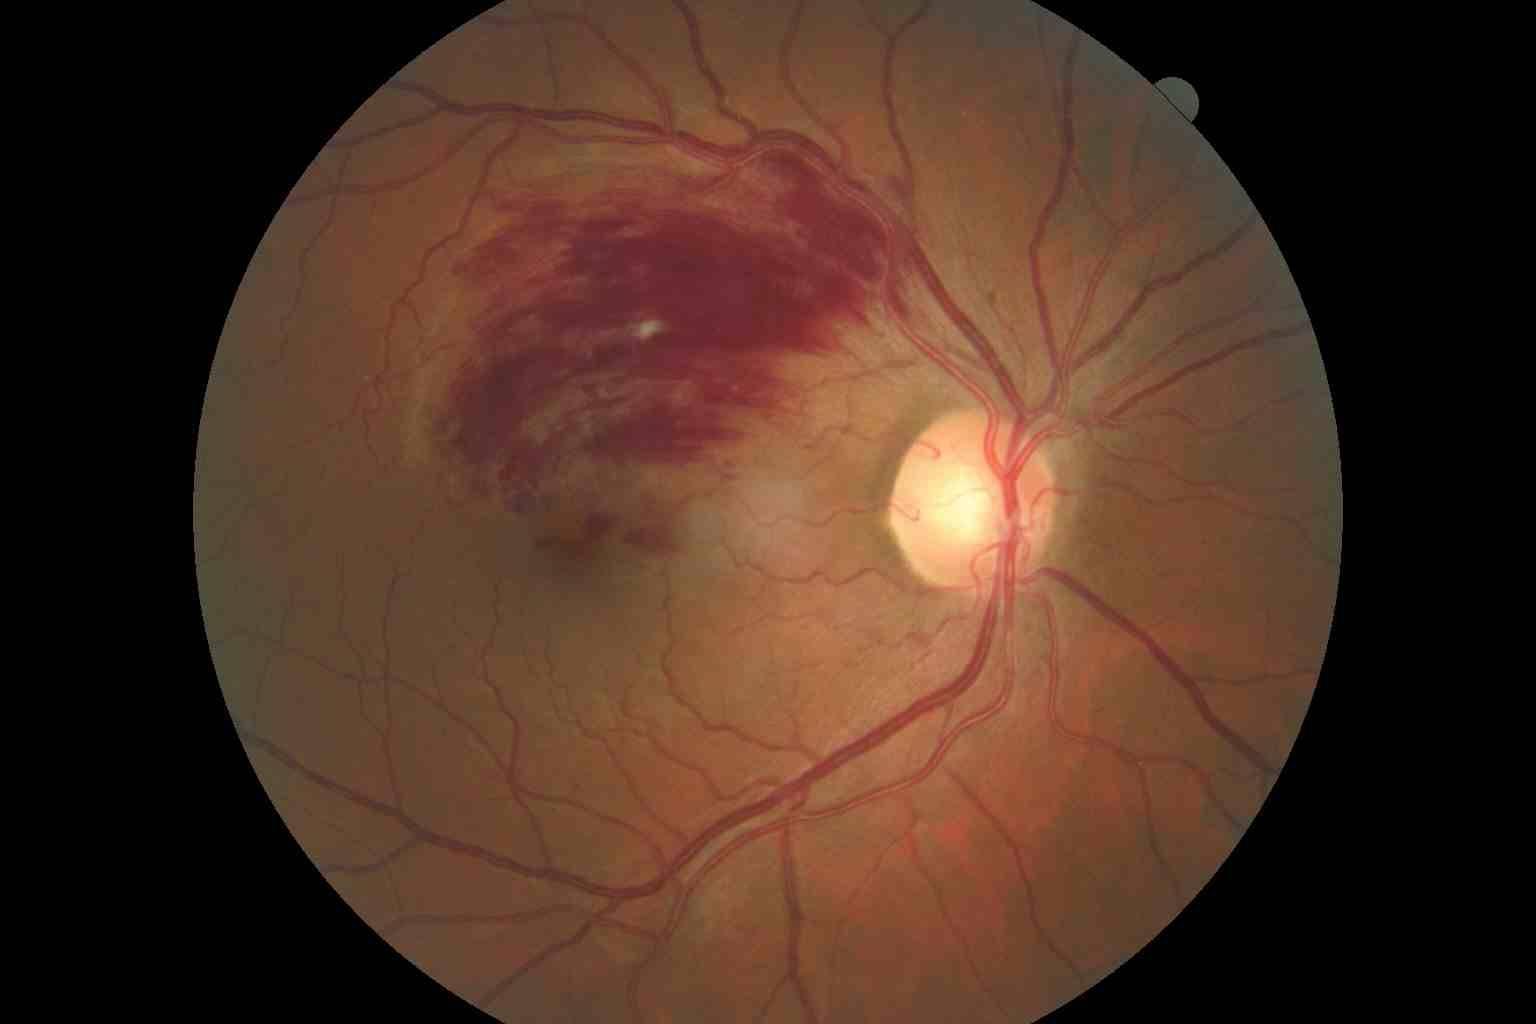 example of retinal photo